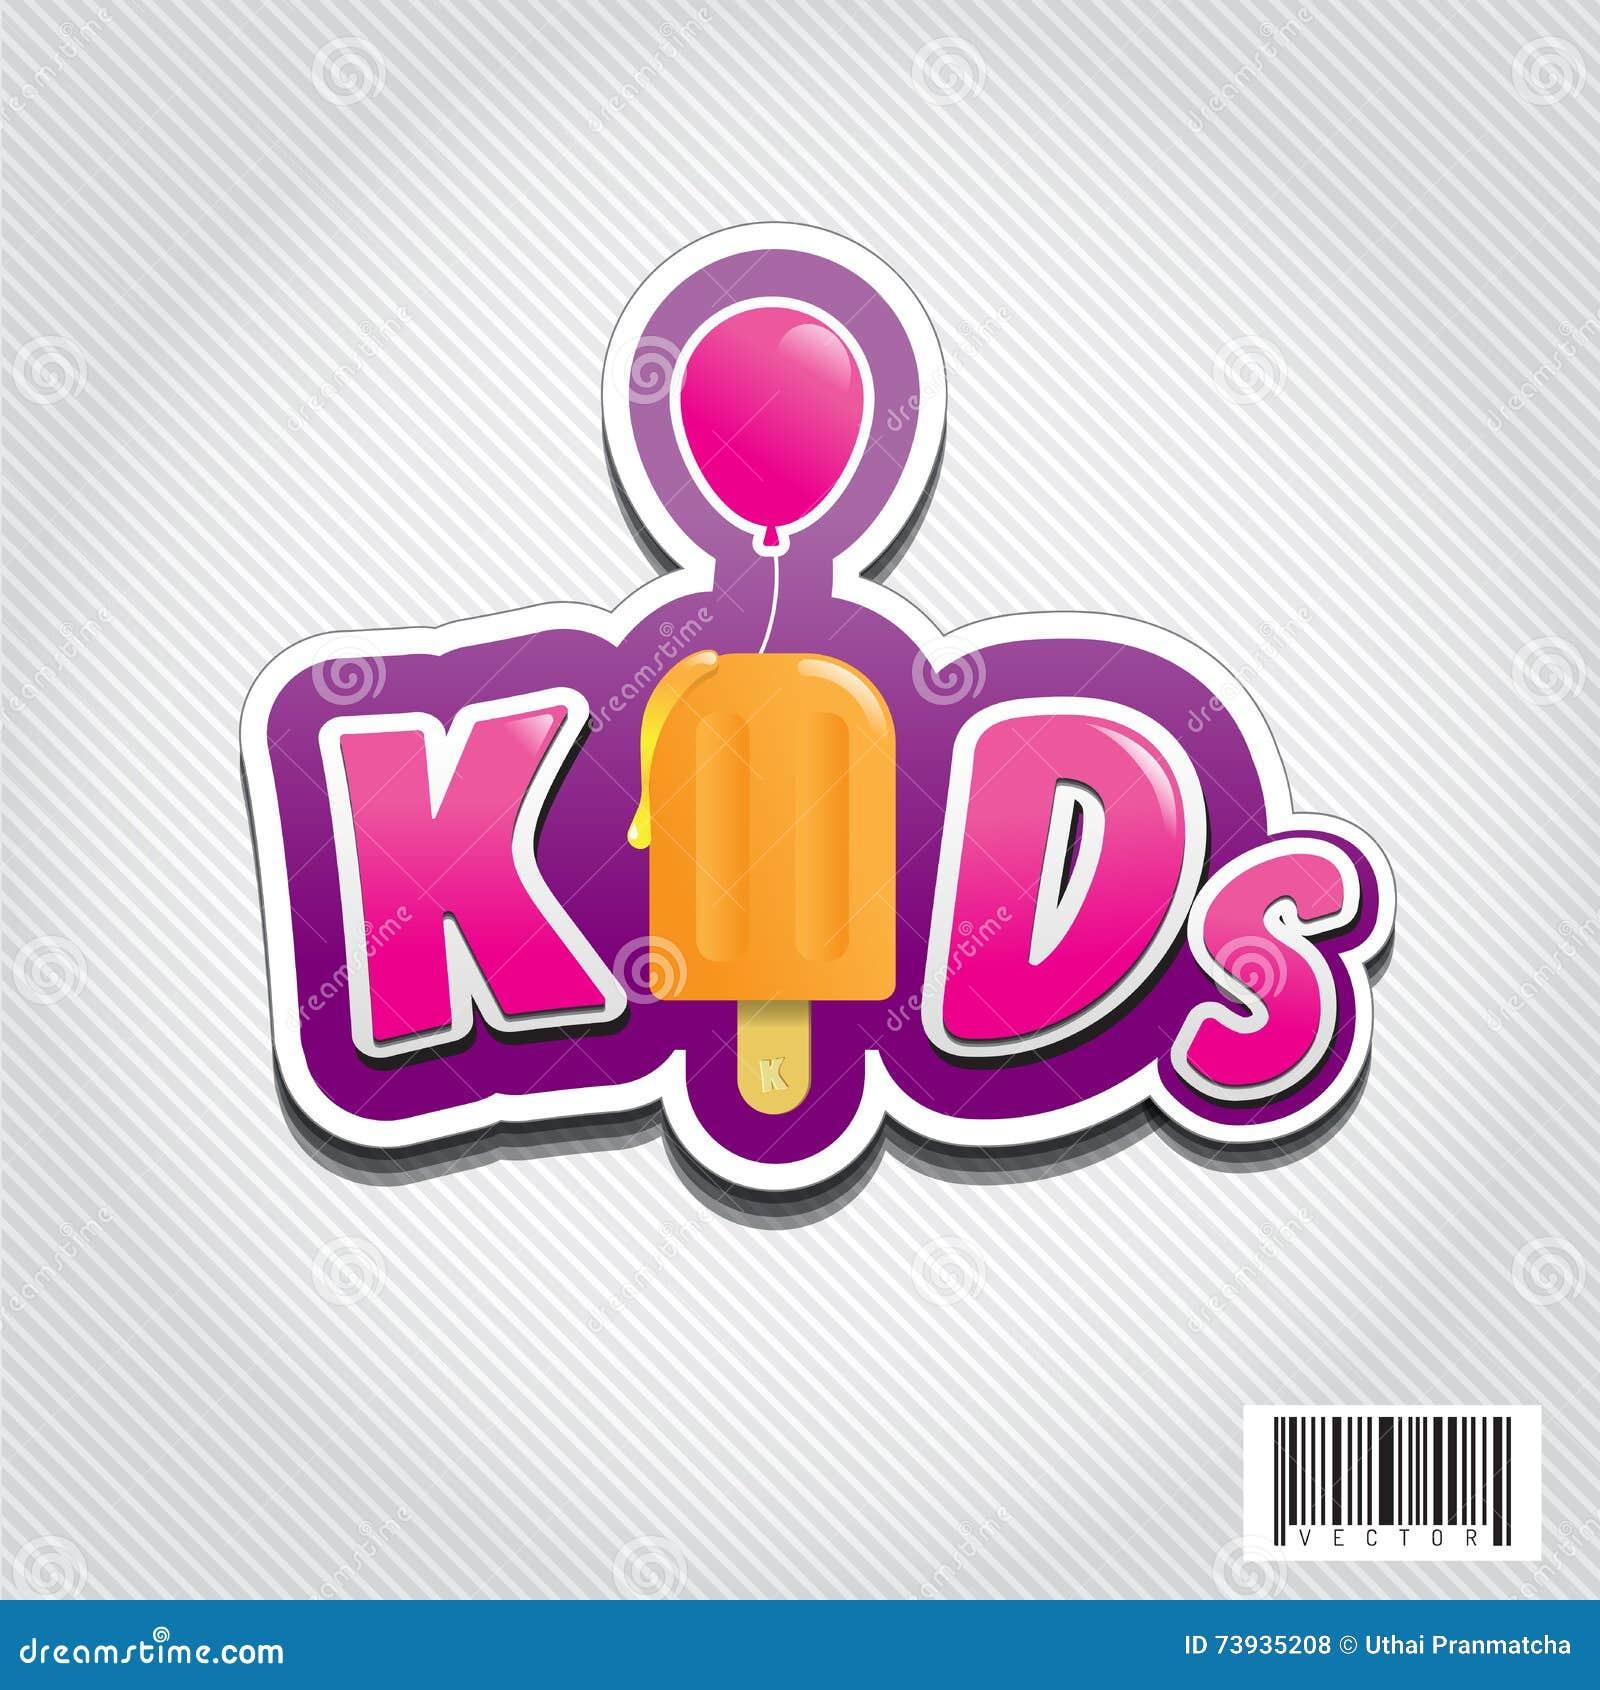 Kid Logo Design With Ice Cream And Balloon Symbol Stock